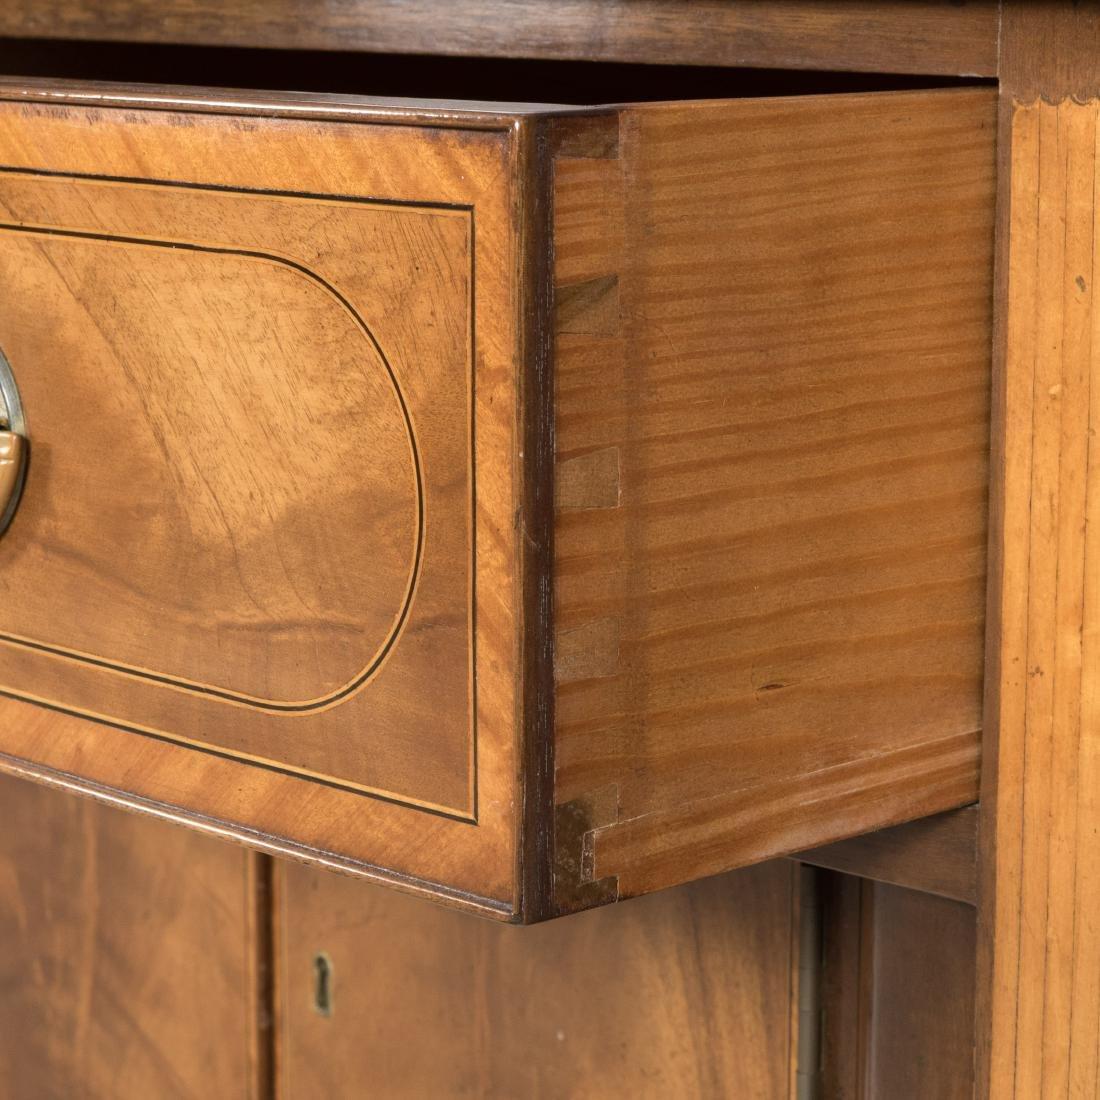 Inlaid Mahogany Colonial Williamsburg Sideboard - 9